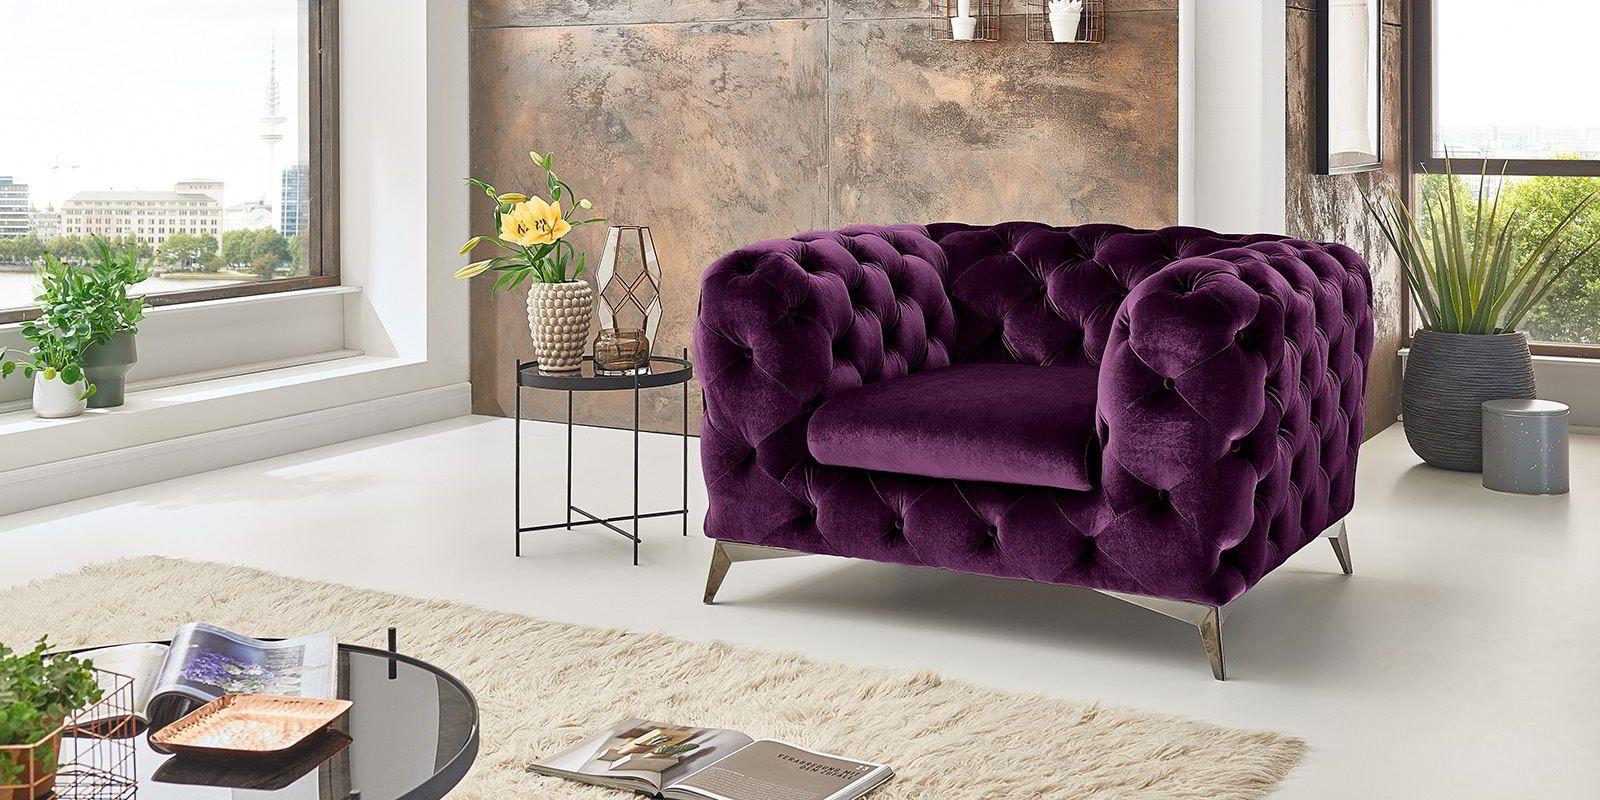 Chesterfield Sessel Big Emma Samt Moebella24 Chesterfield Sessel Sofa Design Wohnzimmer Design